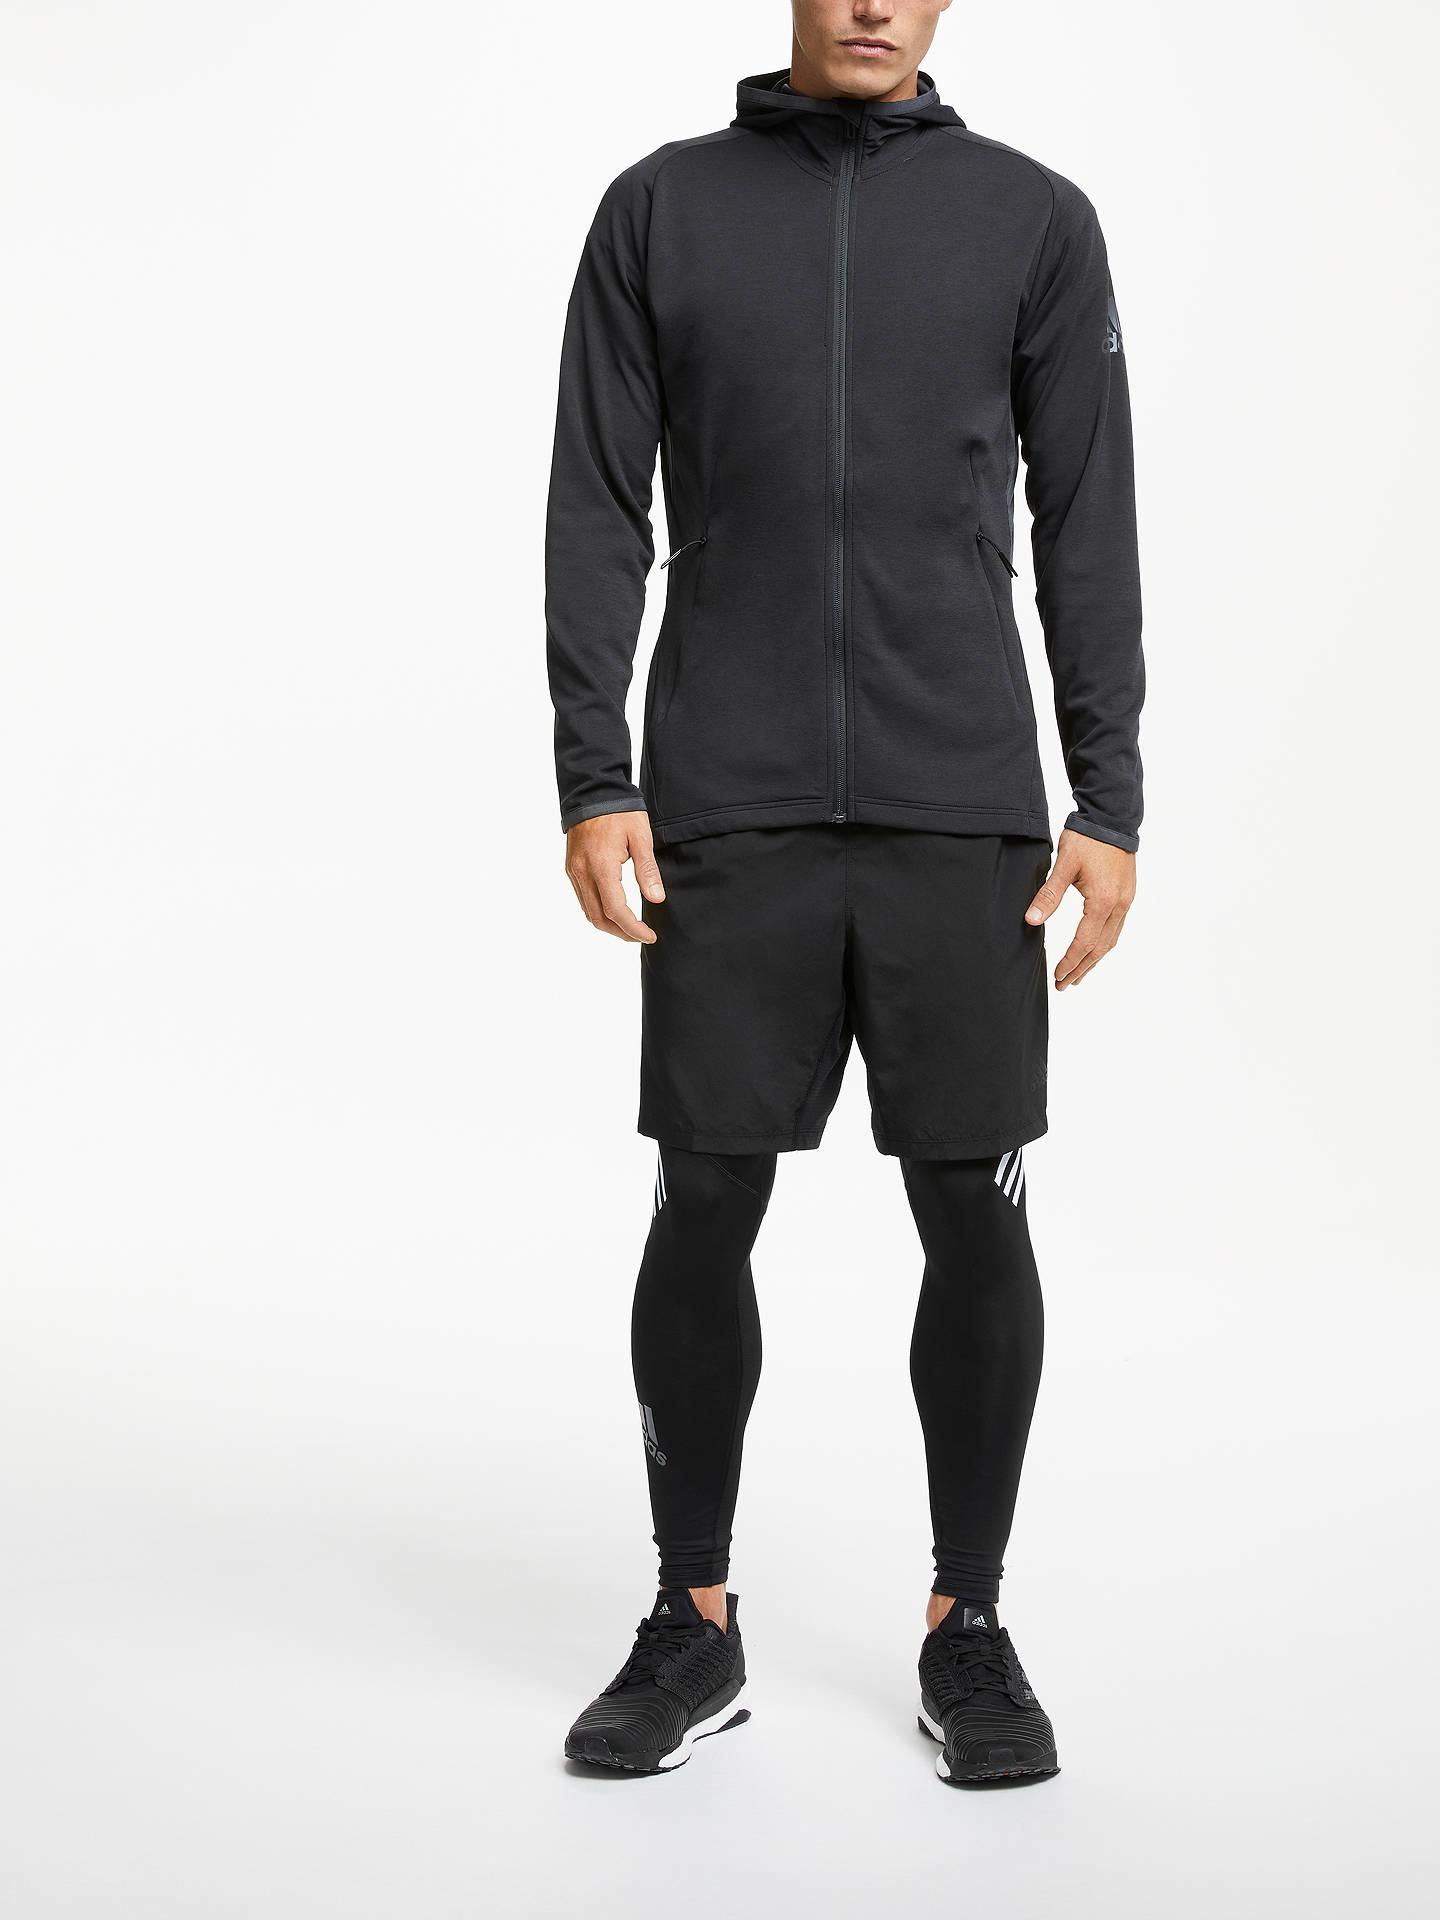 adidas FreeLift Climacool Hooded Jacket Men carbon black